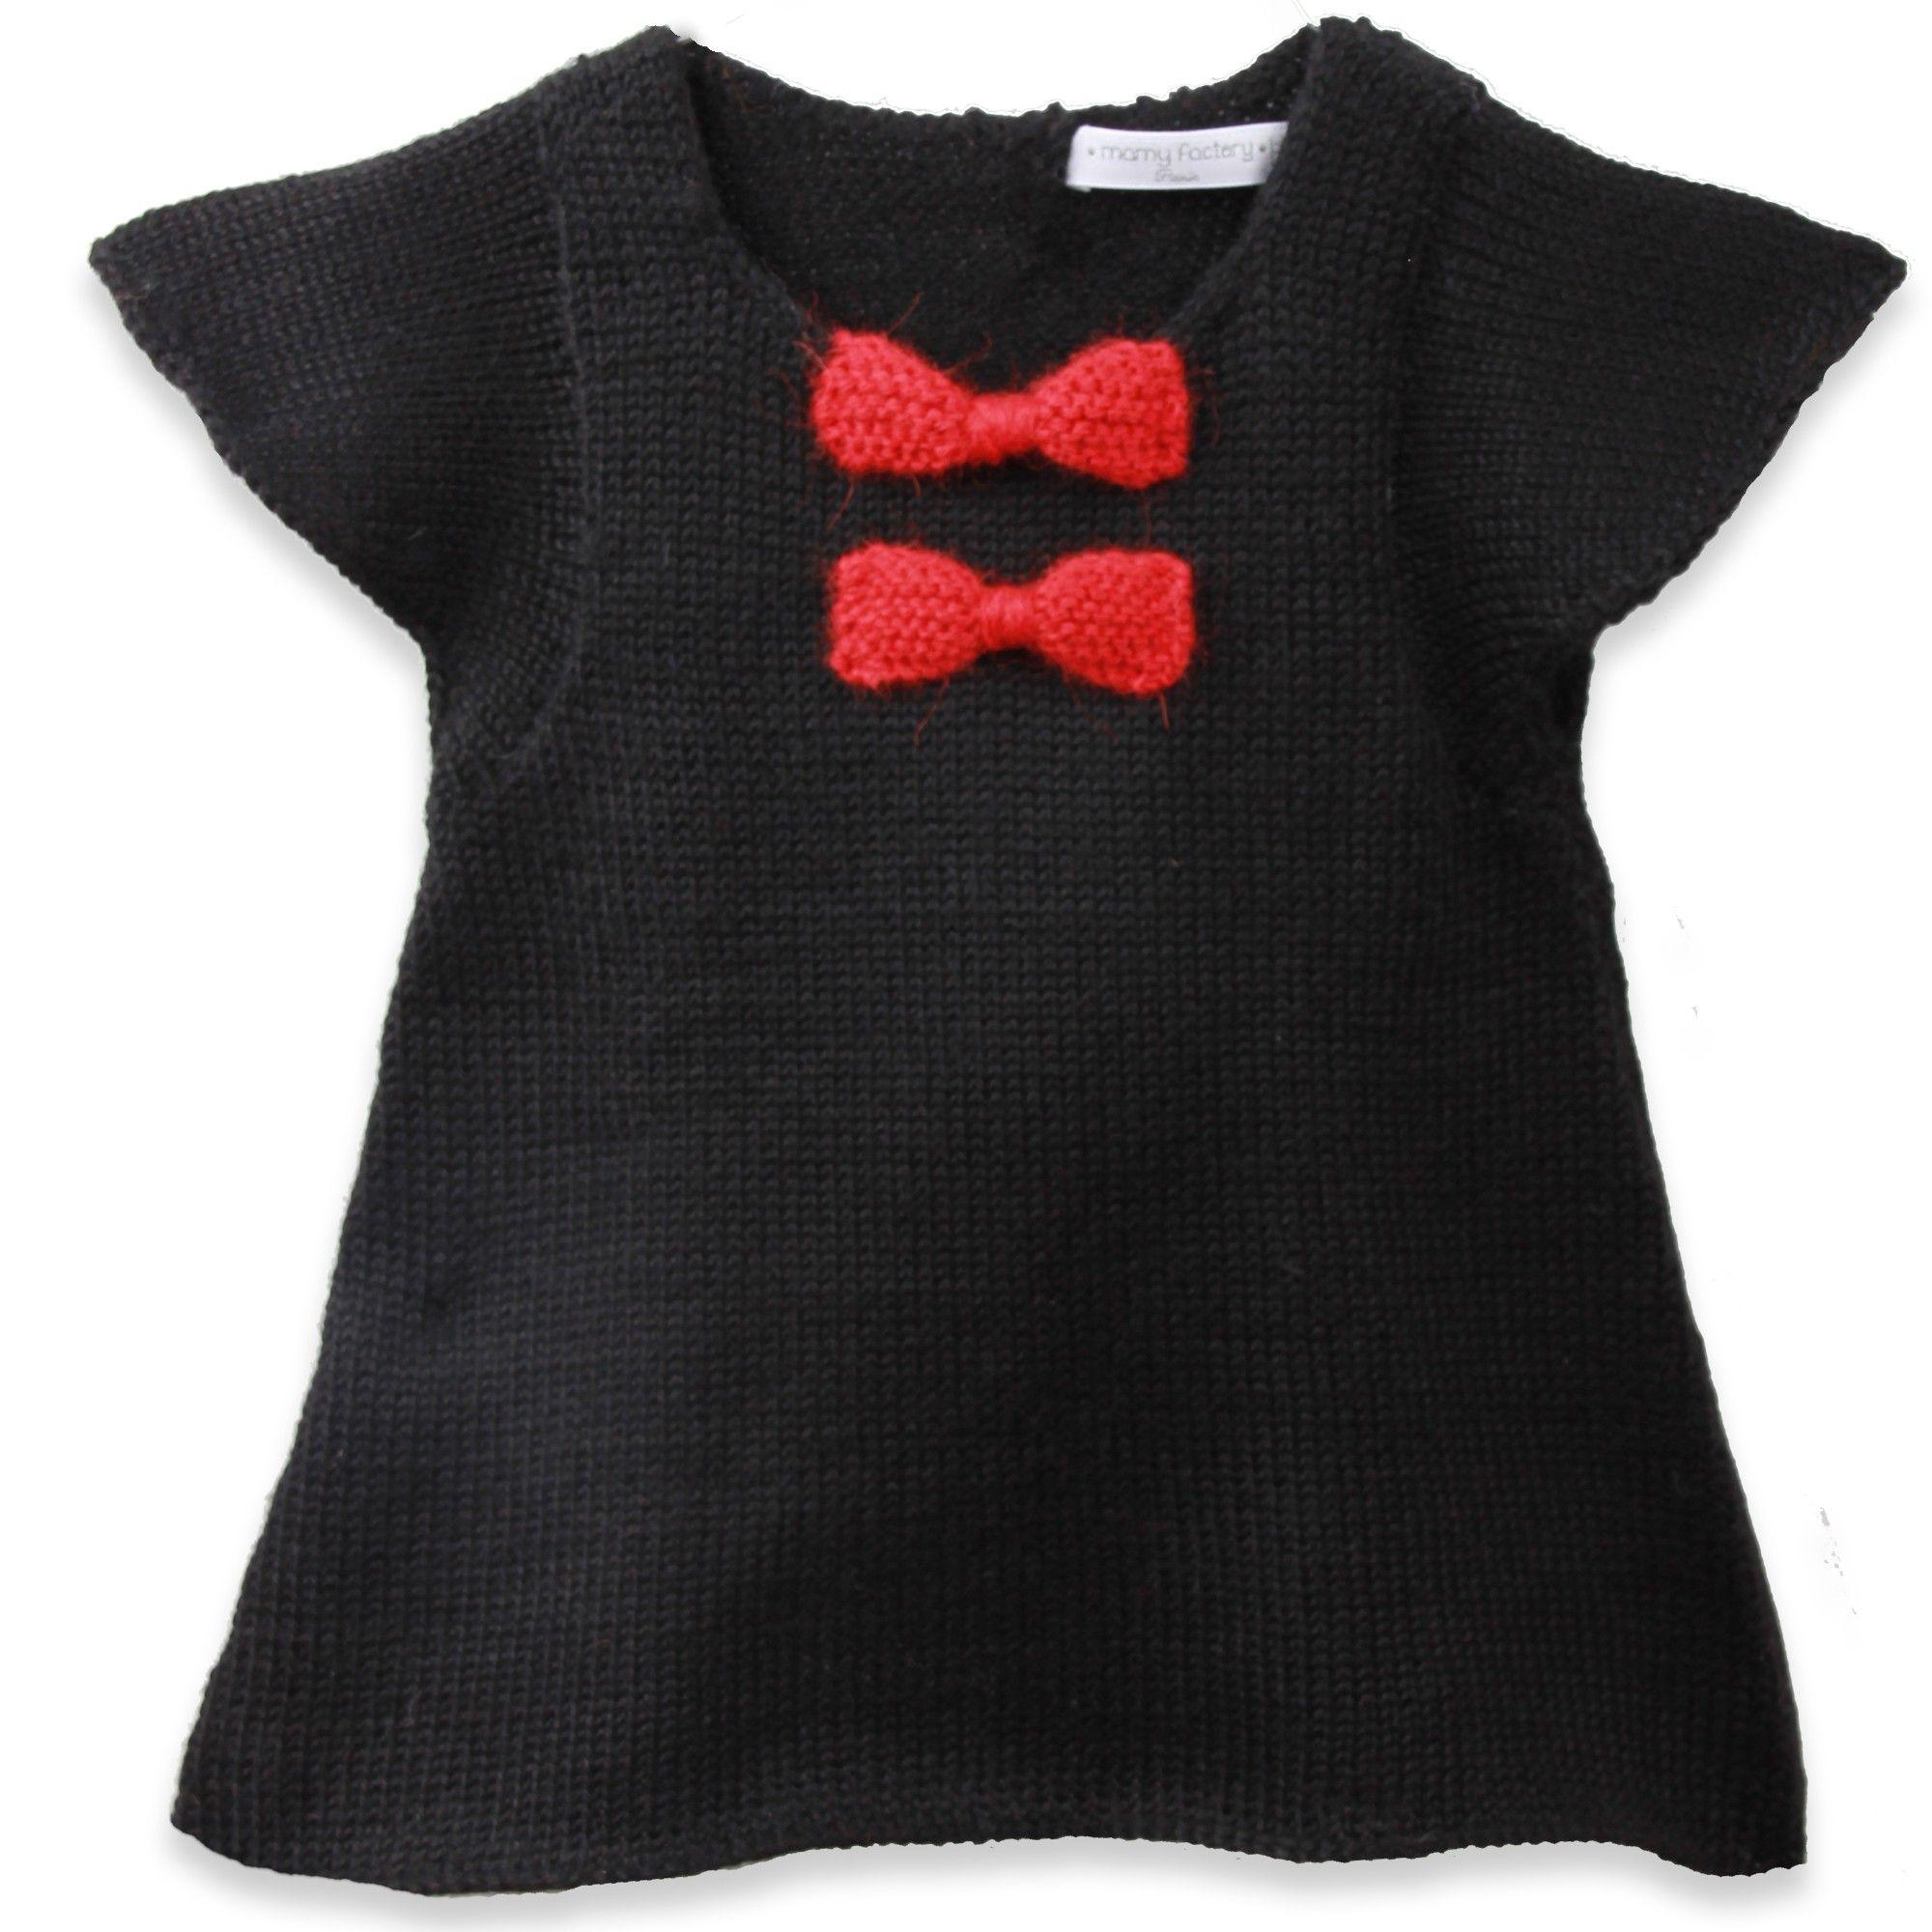 modele tricot gratuit robe fille